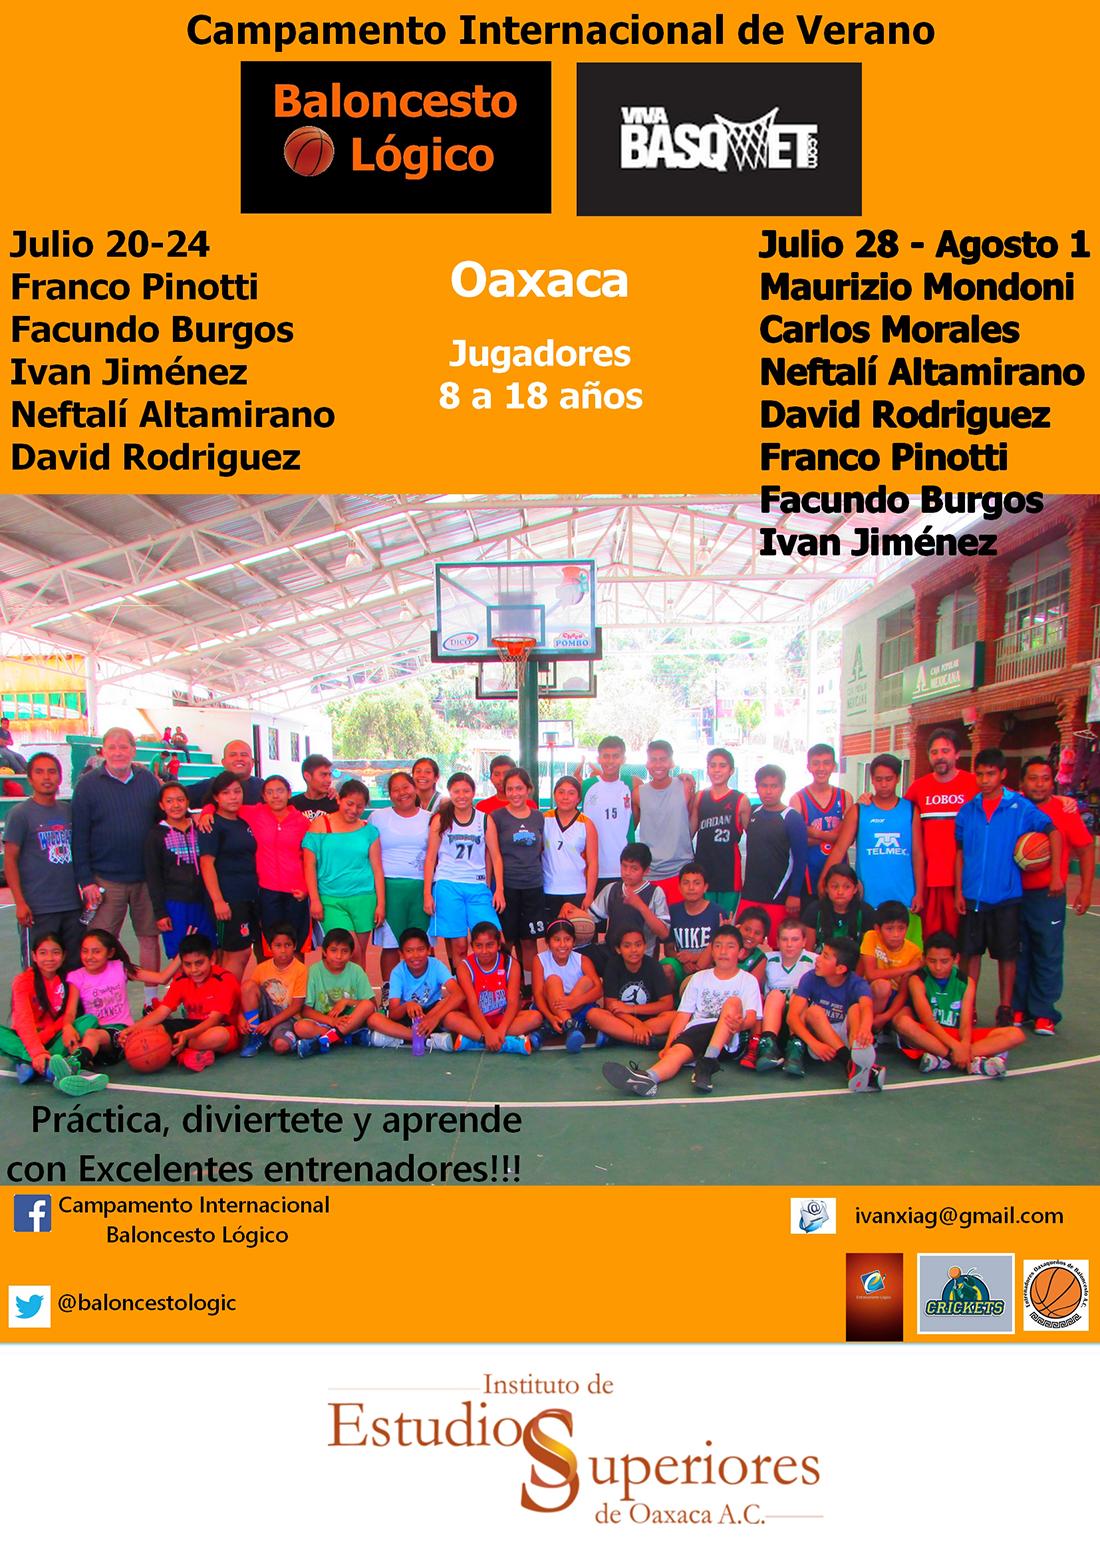 campamento internacional de verano baloncesto logico